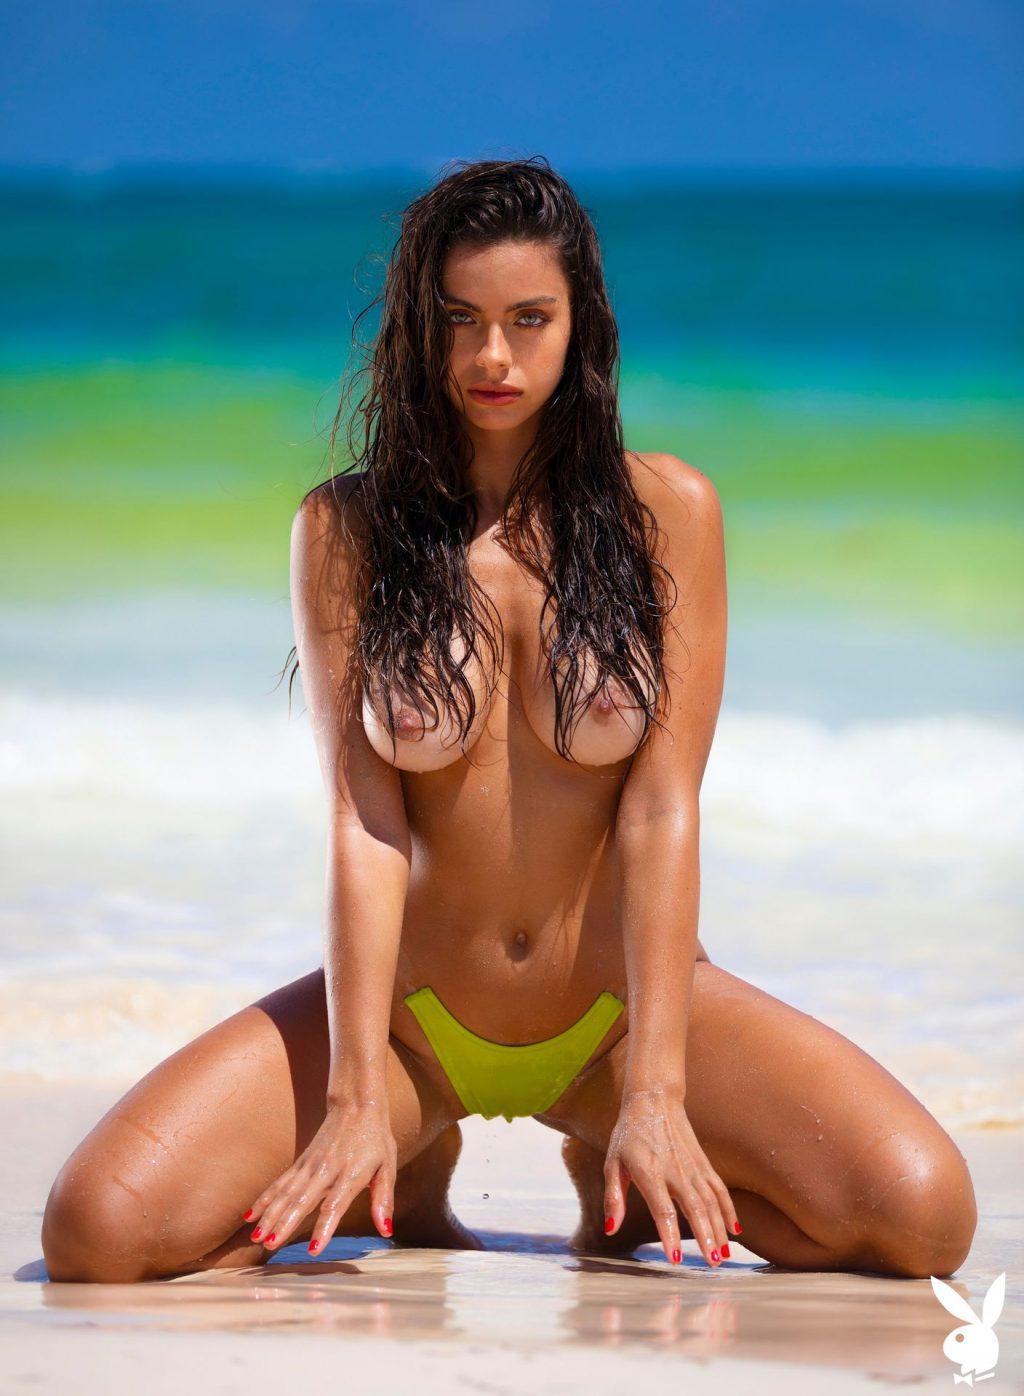 Priscilla Huggins Ortiz Flaunts Her Big Boobs on the Beach